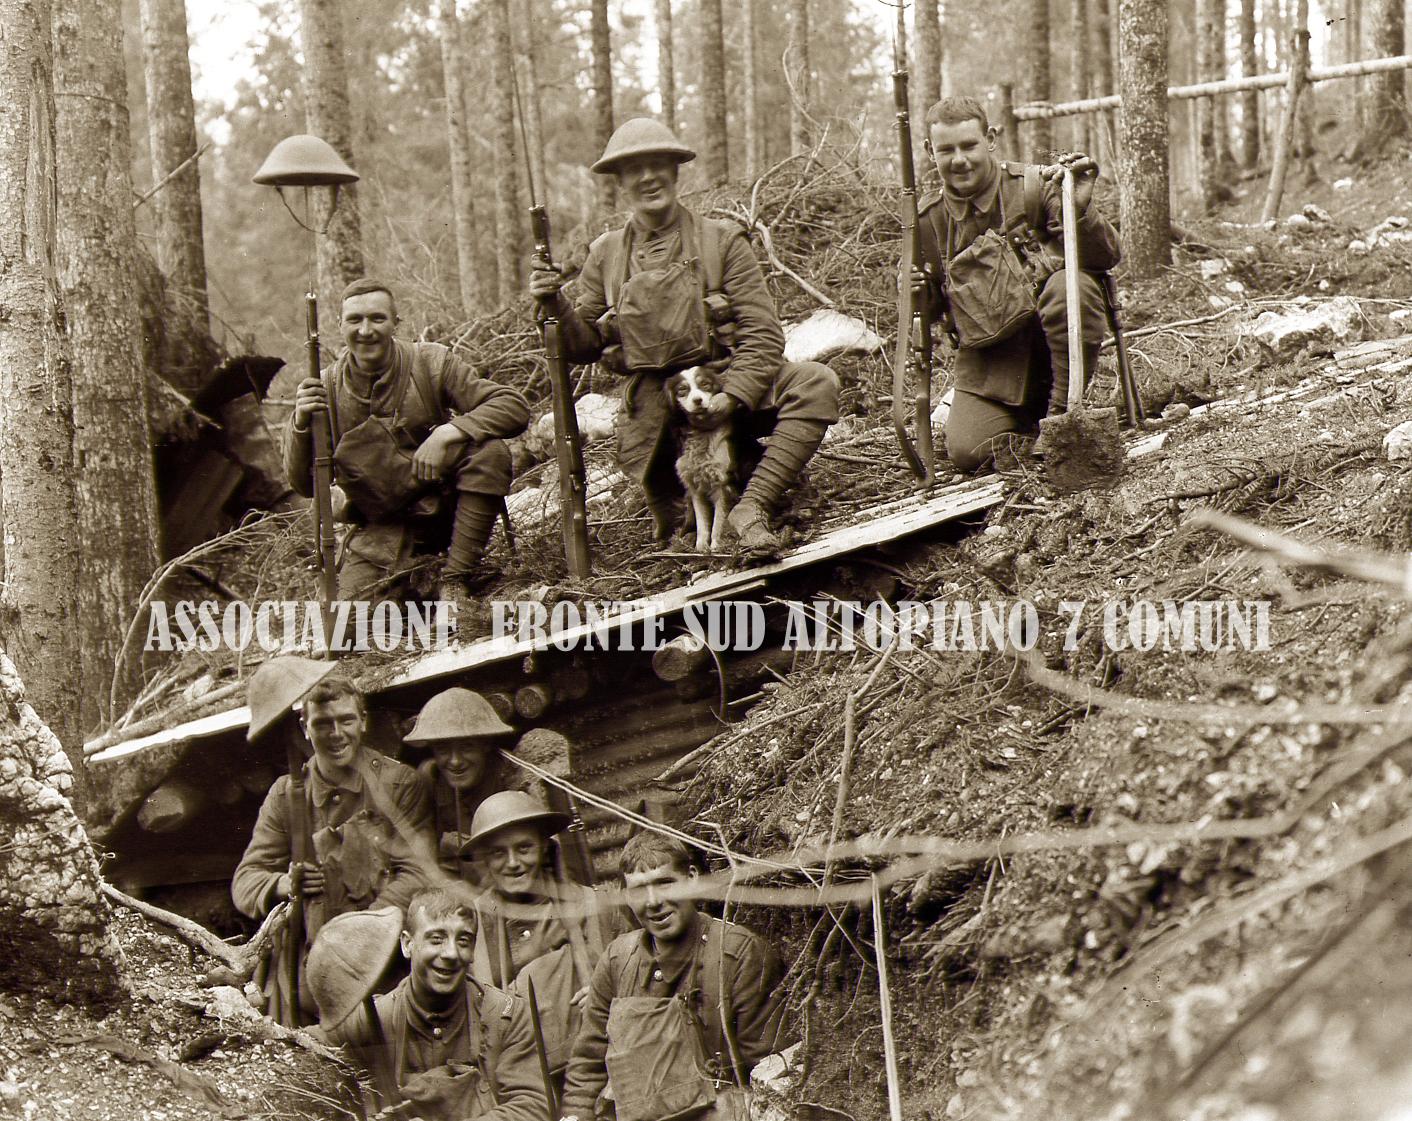 05a - Soldati inglesi in trincea tra gli abeti copia.jpg